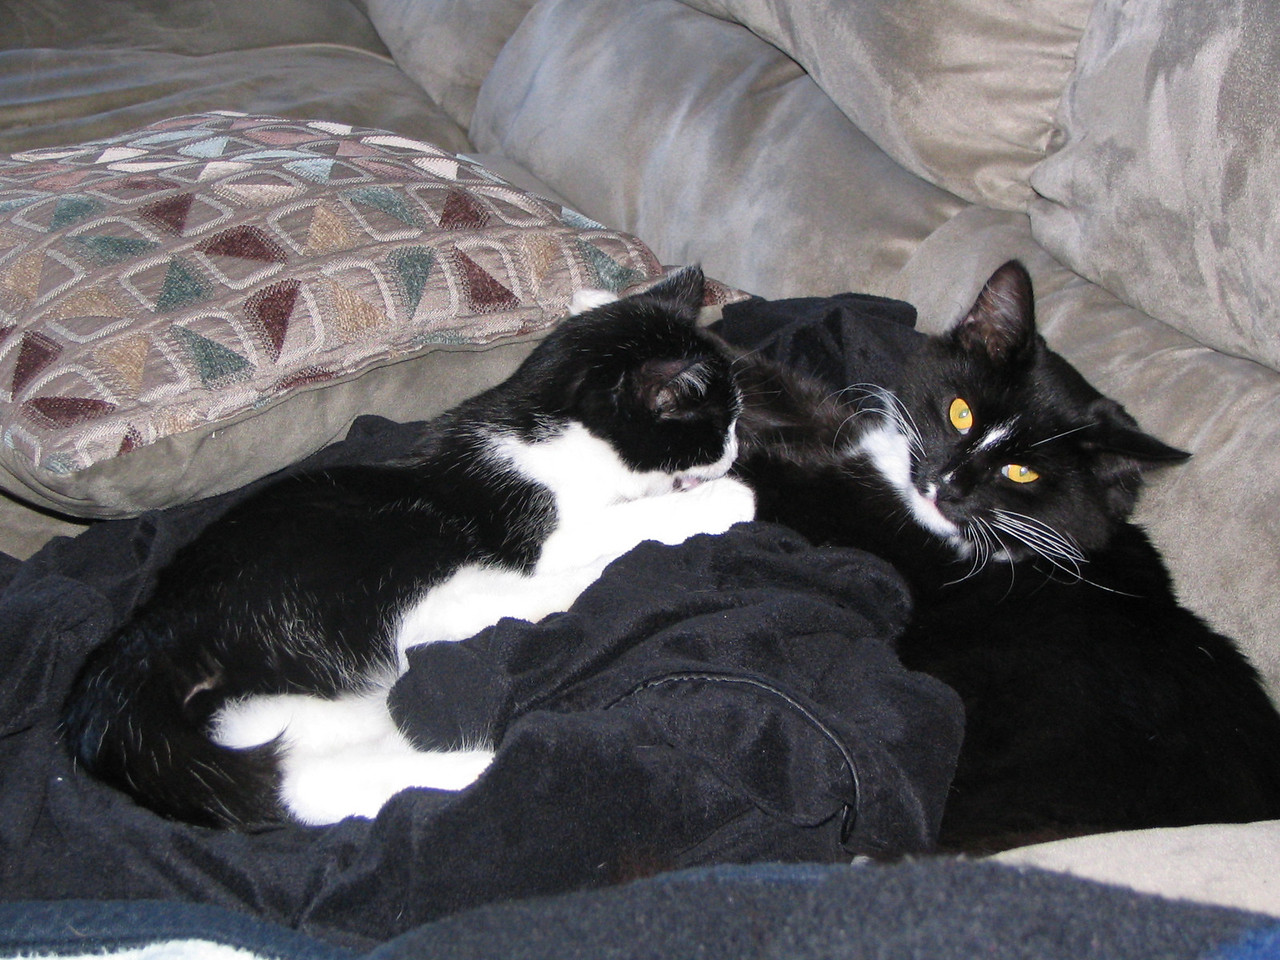 Bella pestering her brother Raider